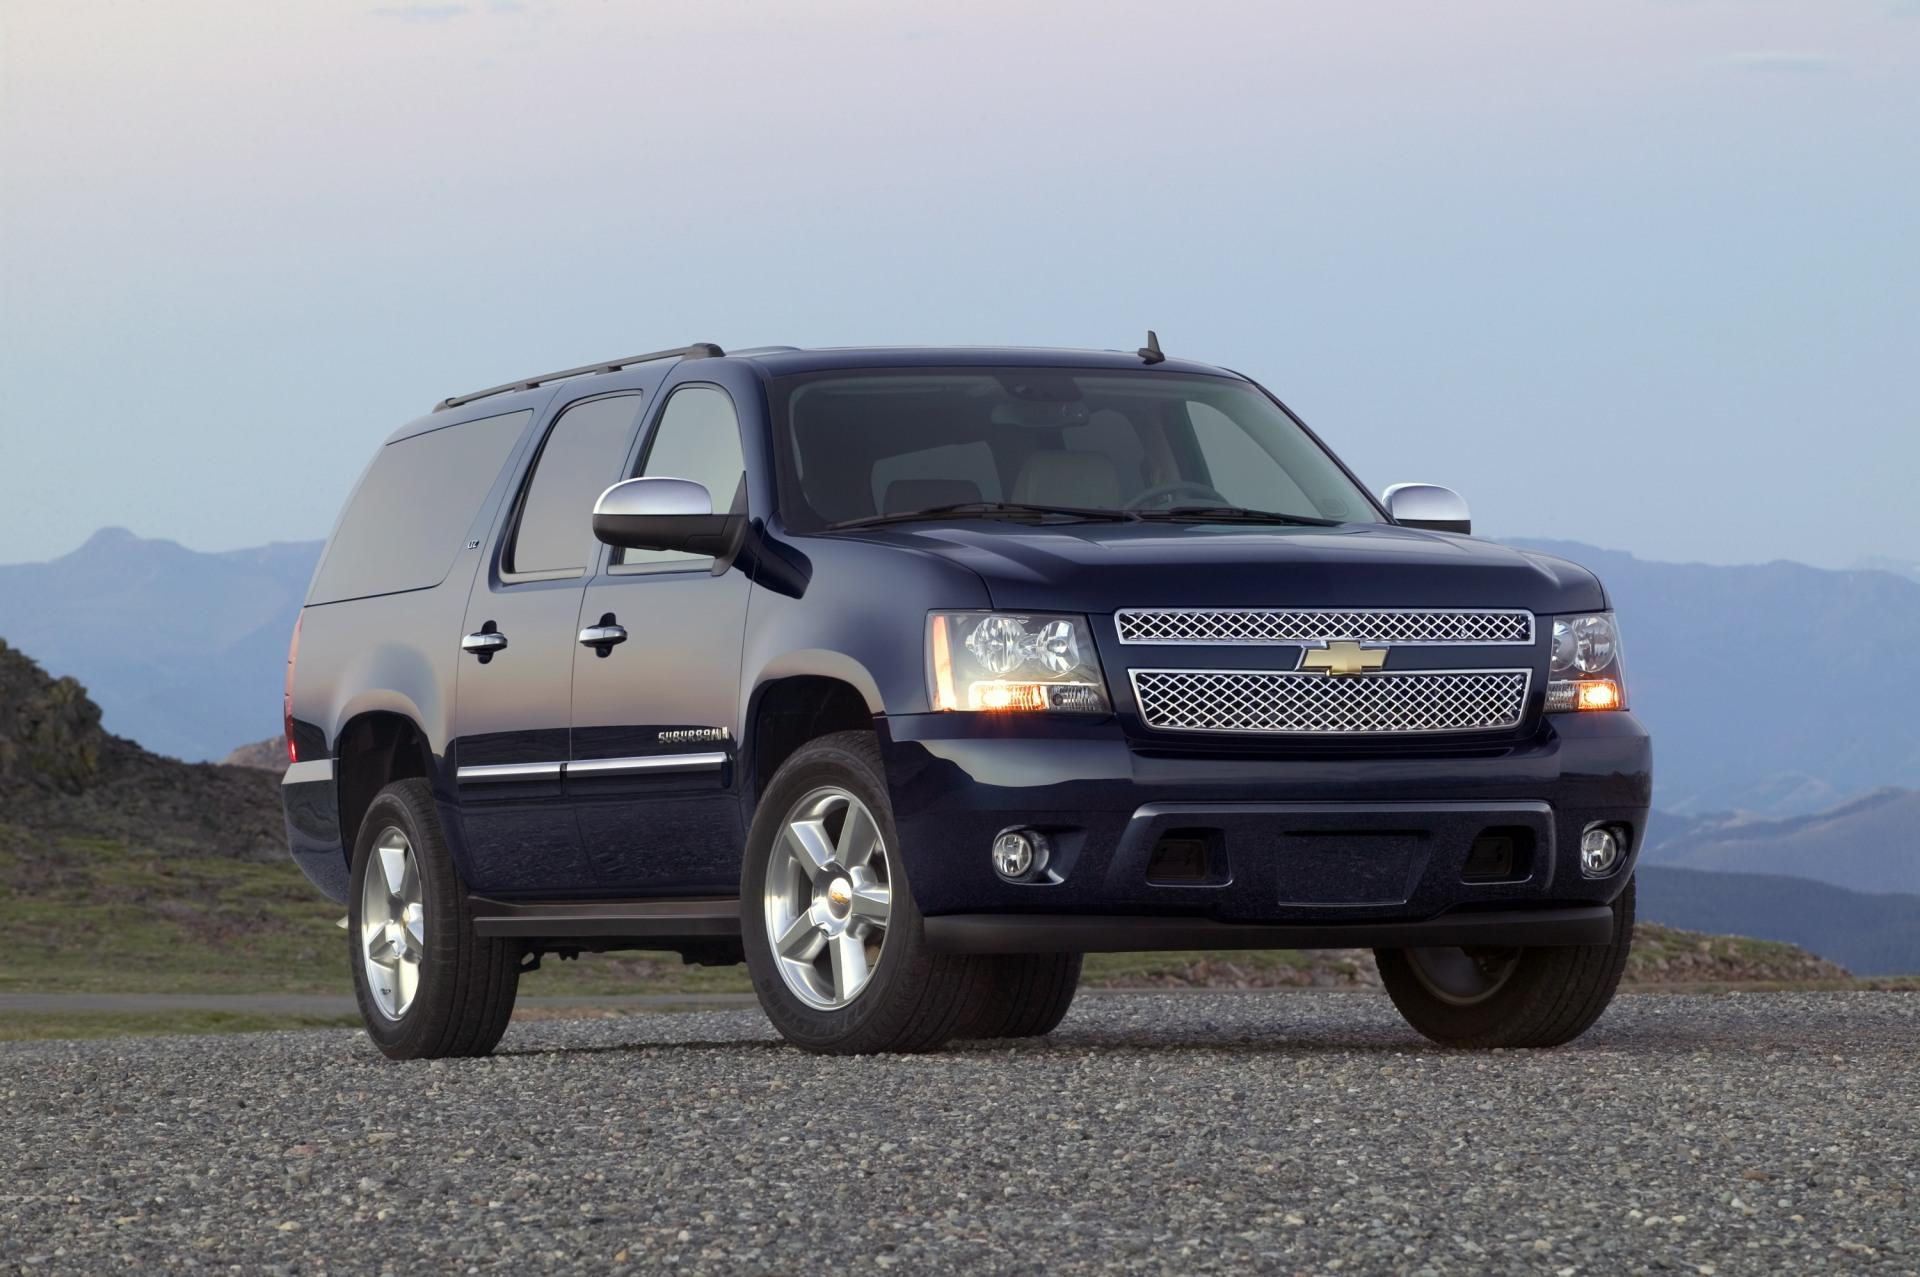 2009 Chevrolet Suburban - conceptcarz.com